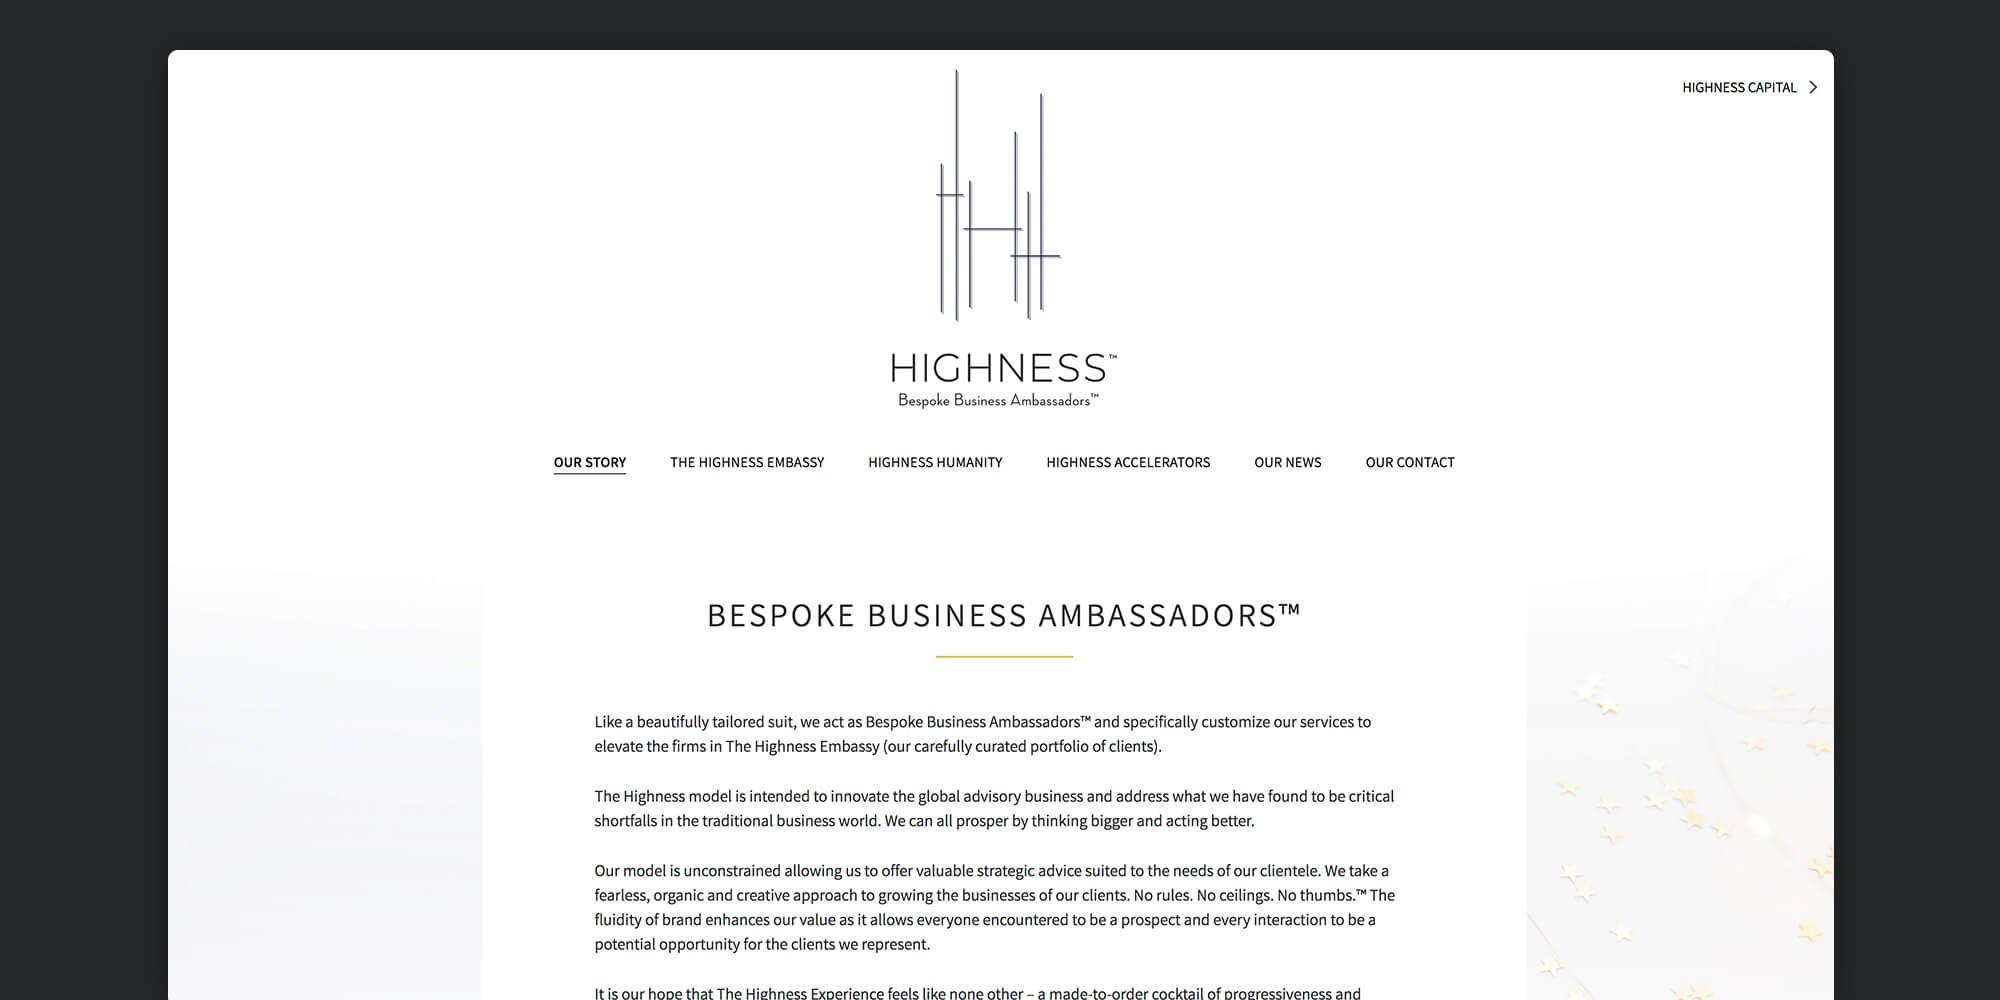 Highness Global Capital